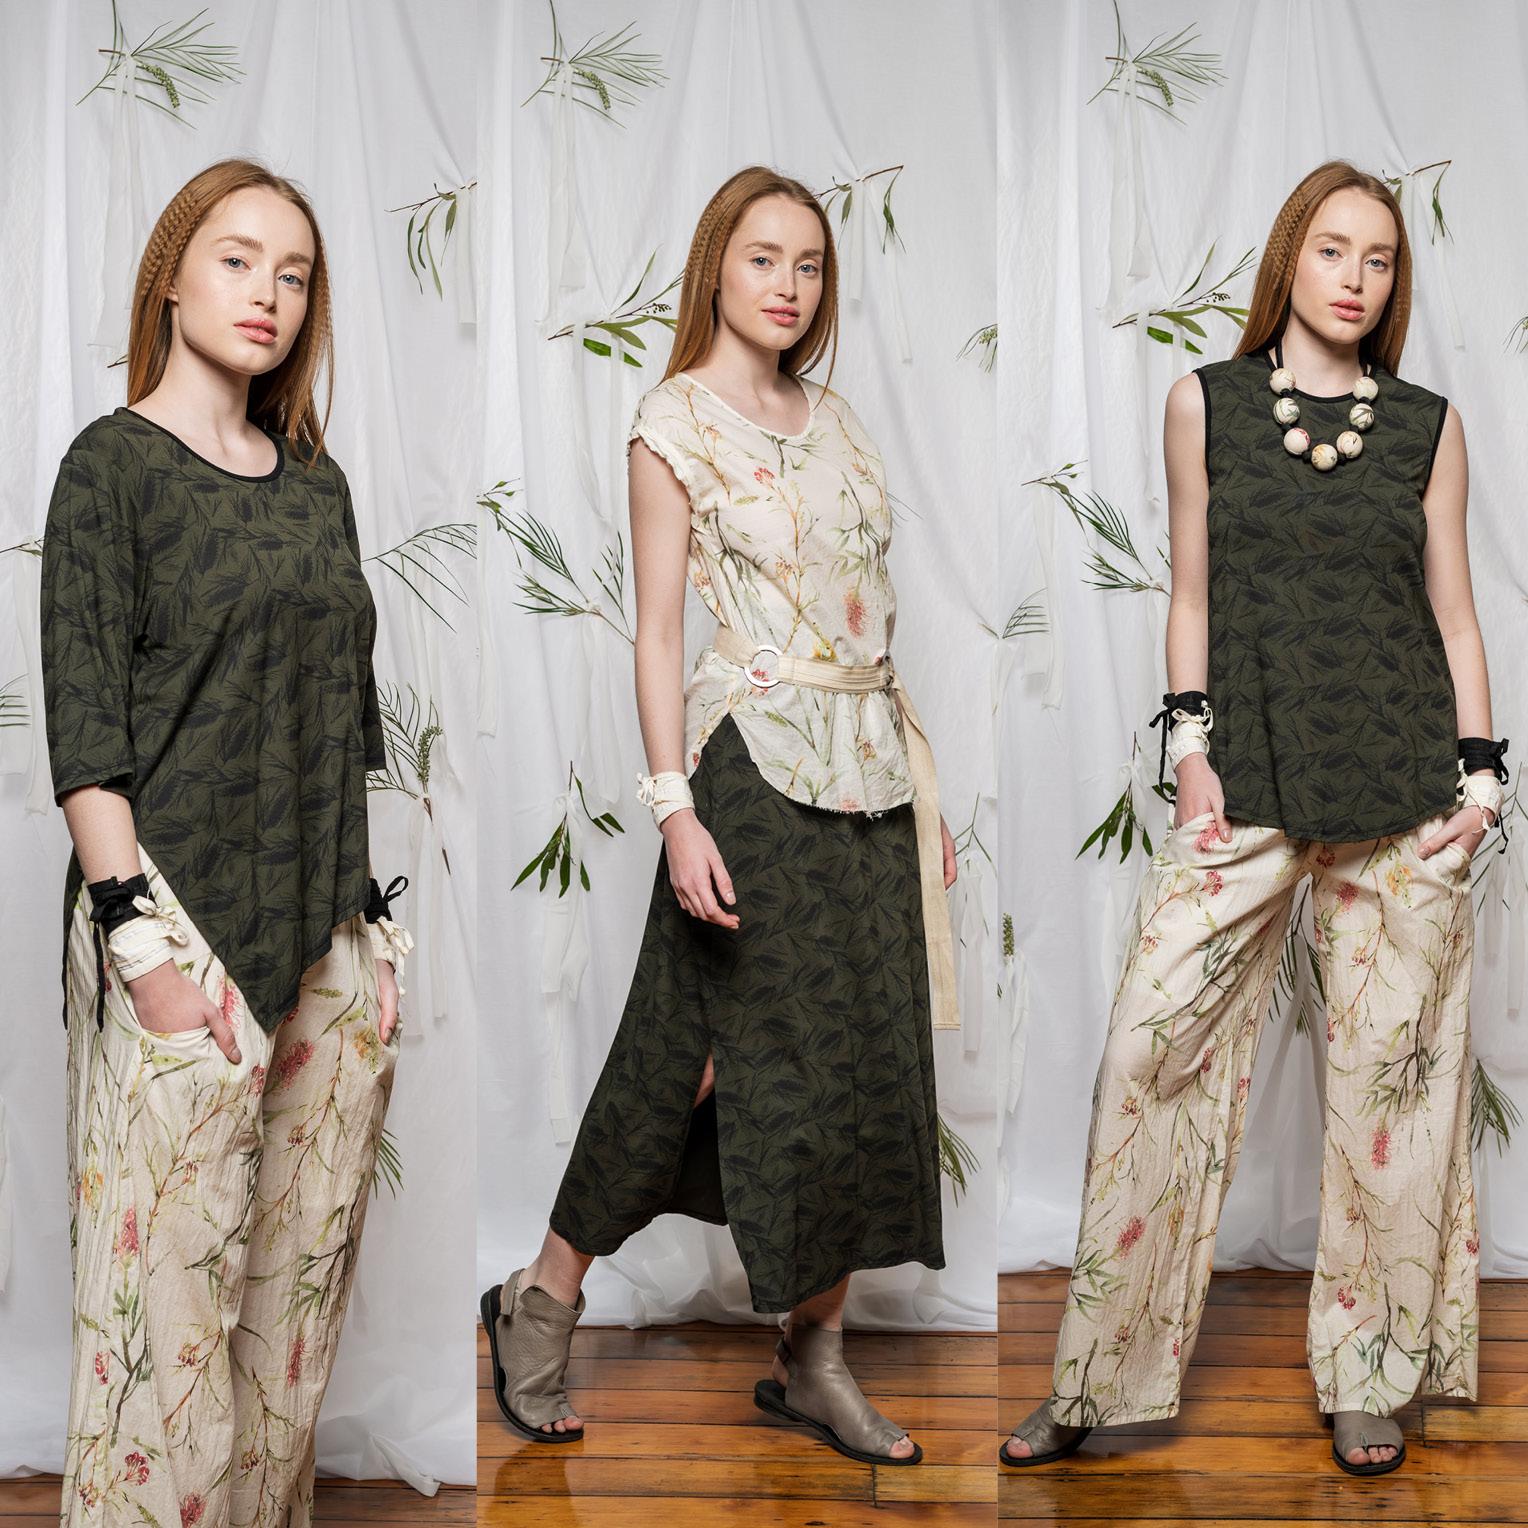 LEFT: Dana Top & Honey Gem Pant  CENTRE: Moonlight top, Emma Skirt & Linen Belt  RIGHT: Nancy Top & Honey Gem Pant